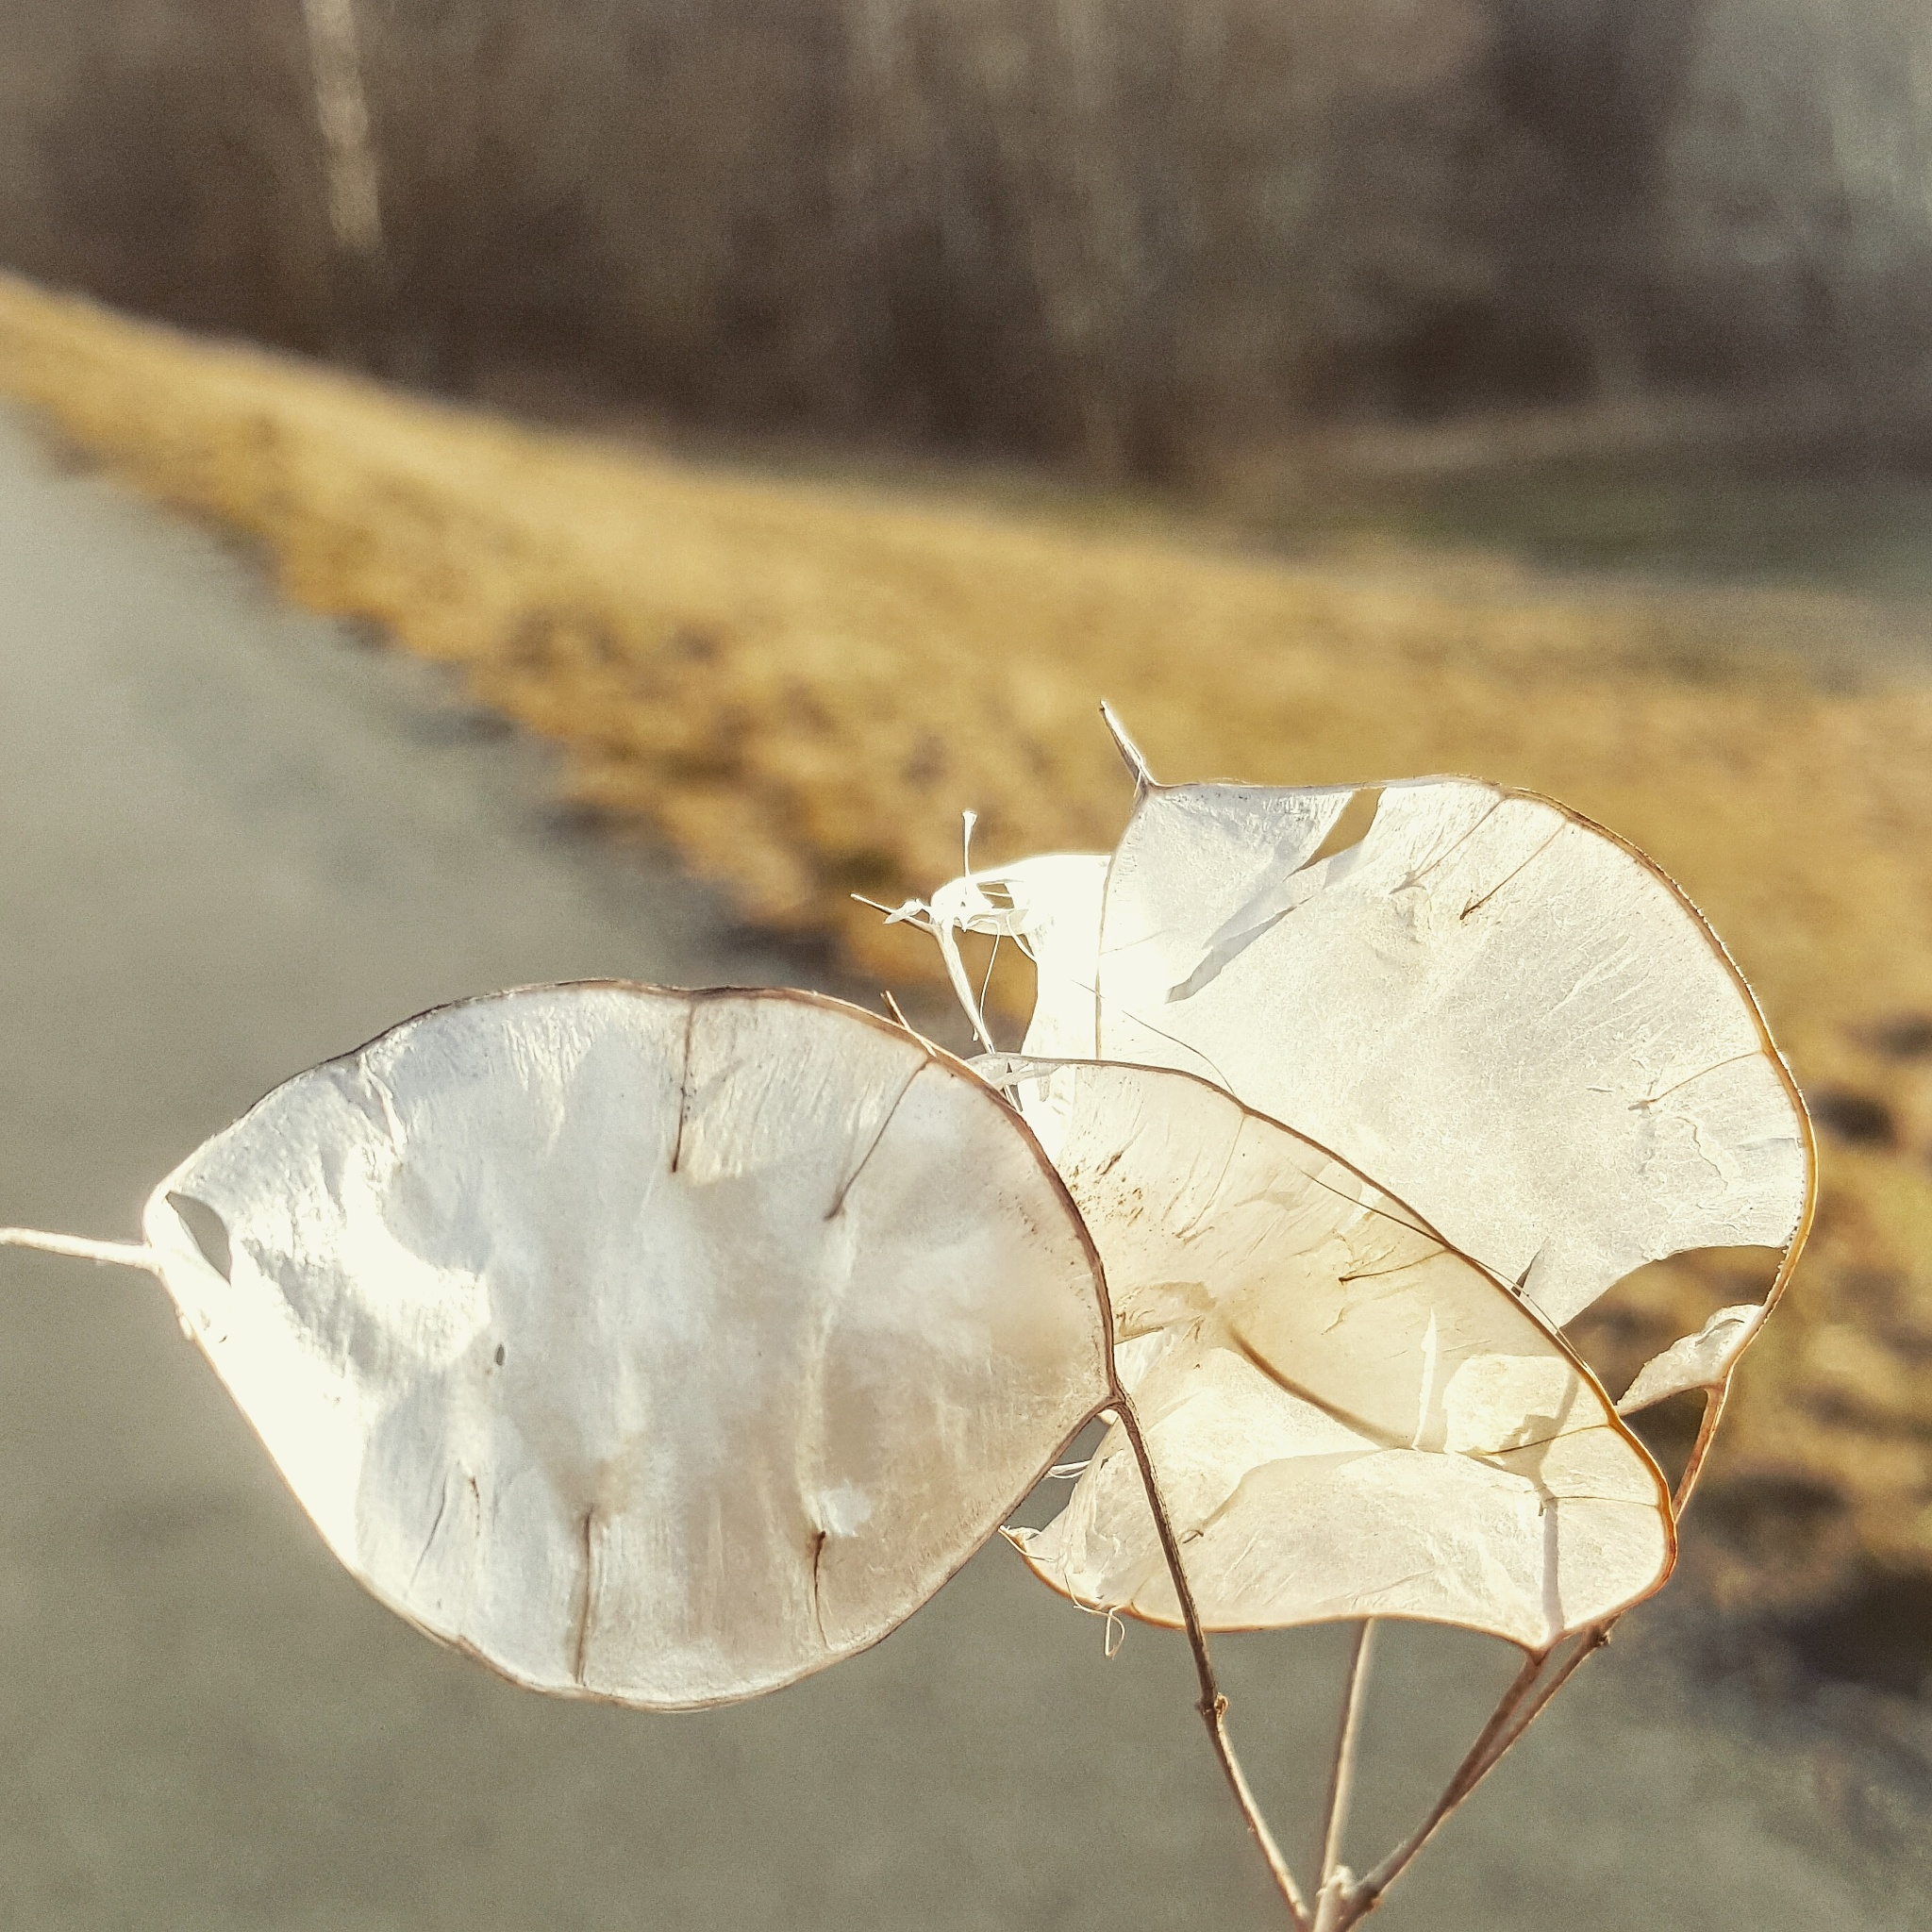 Untitled by Sandra Tiroler